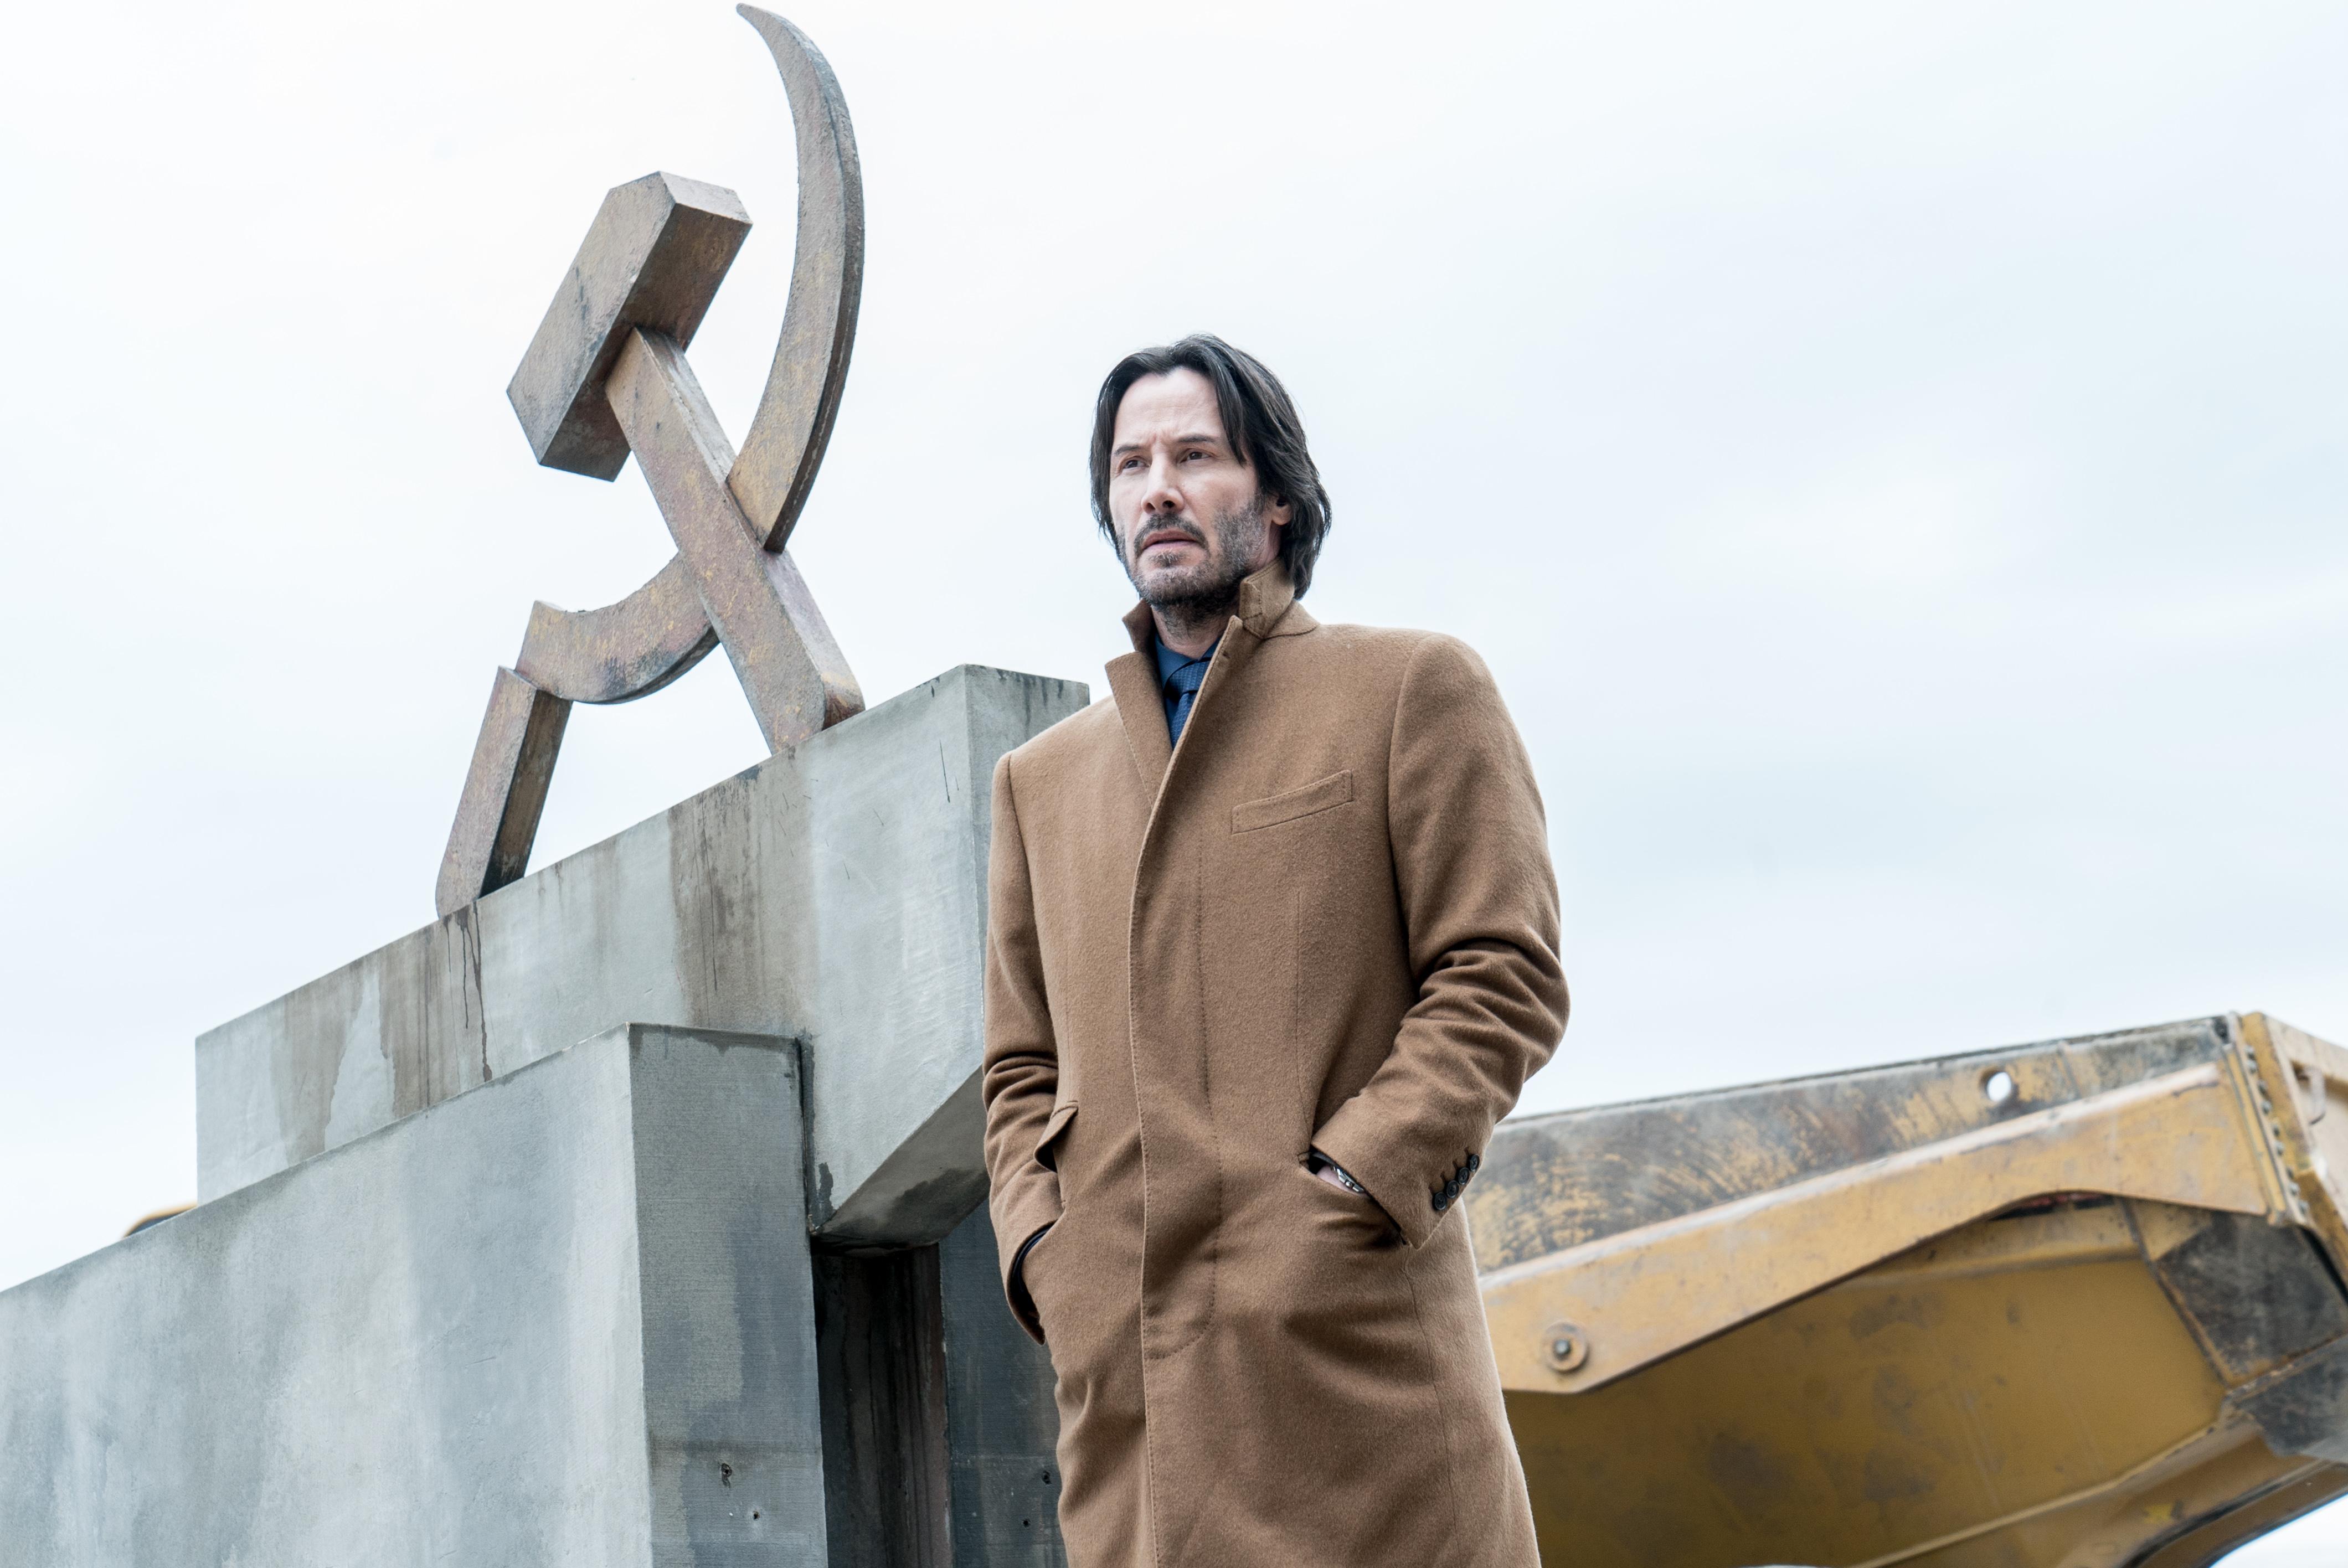 siberia keanu reeves - Trailer de Siberia con Keanu Reeves